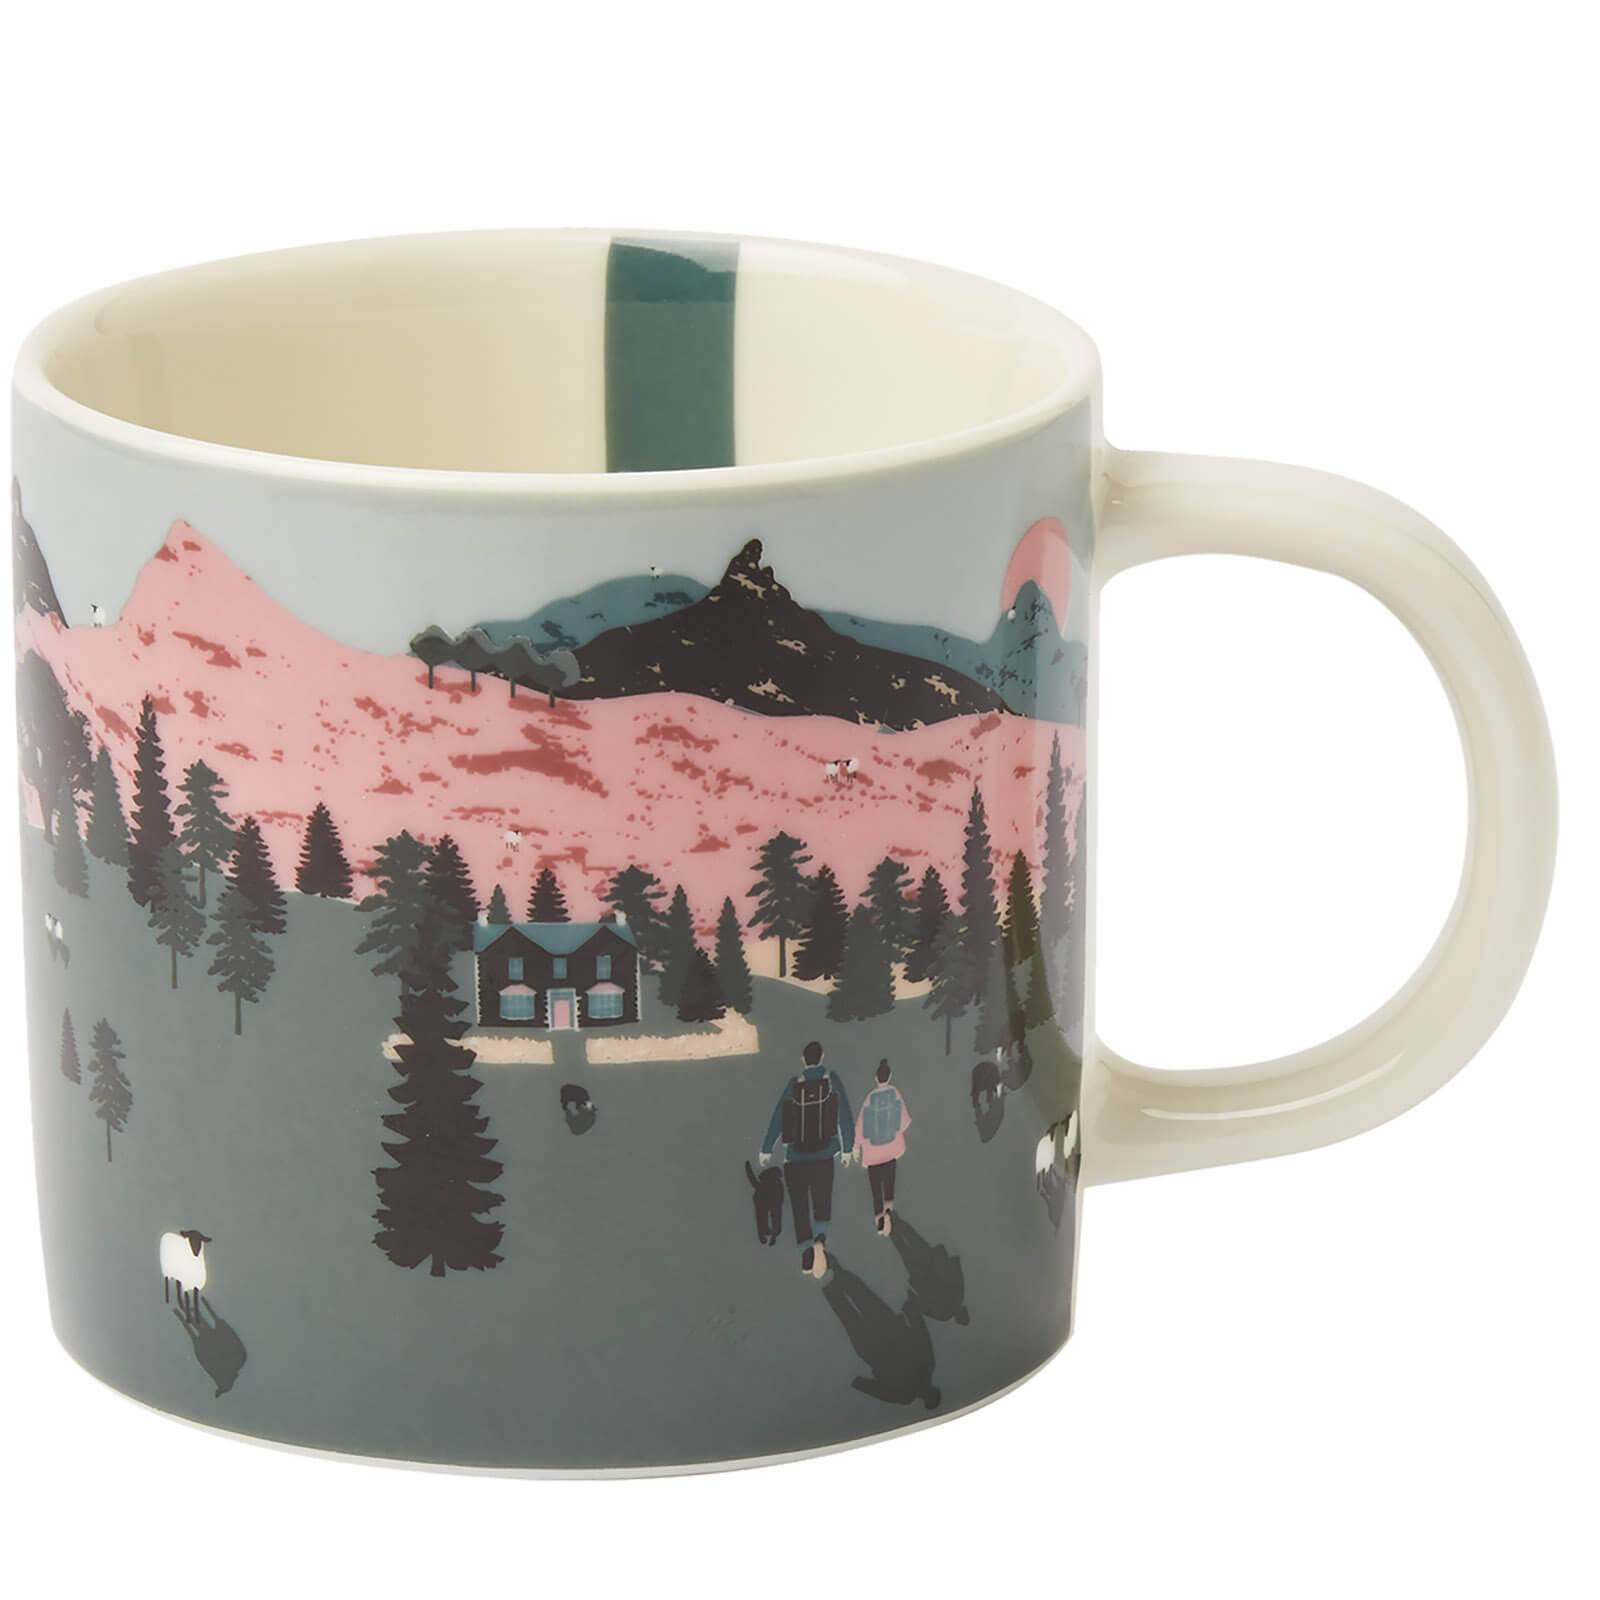 Joules White Dawn Mug